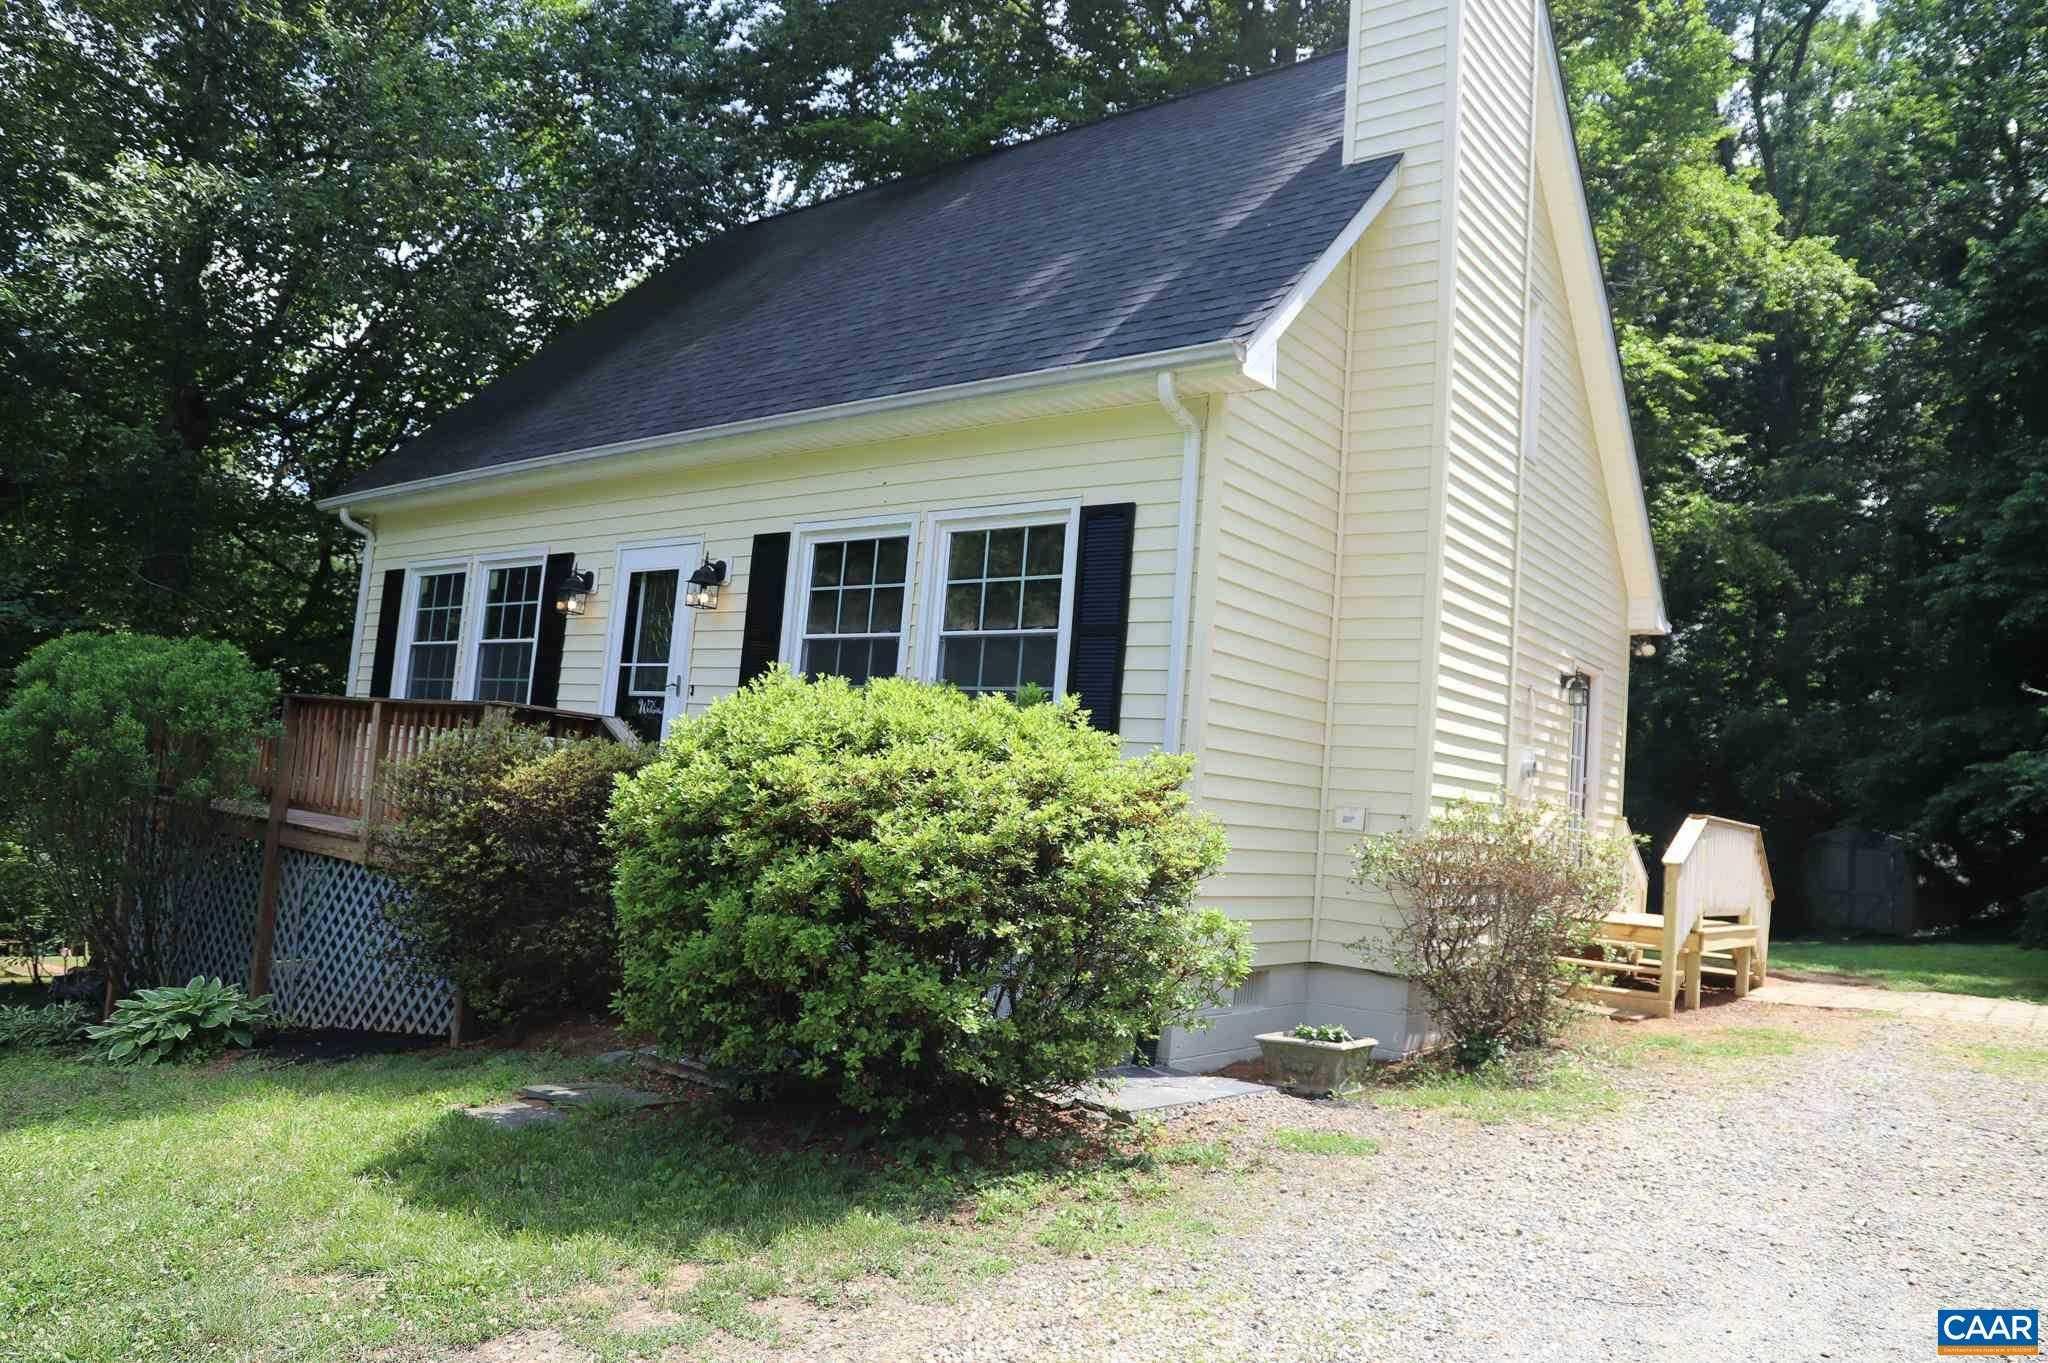 $245,000 - 4Br/2Ba -  for Sale in Trailside, Ruckersville